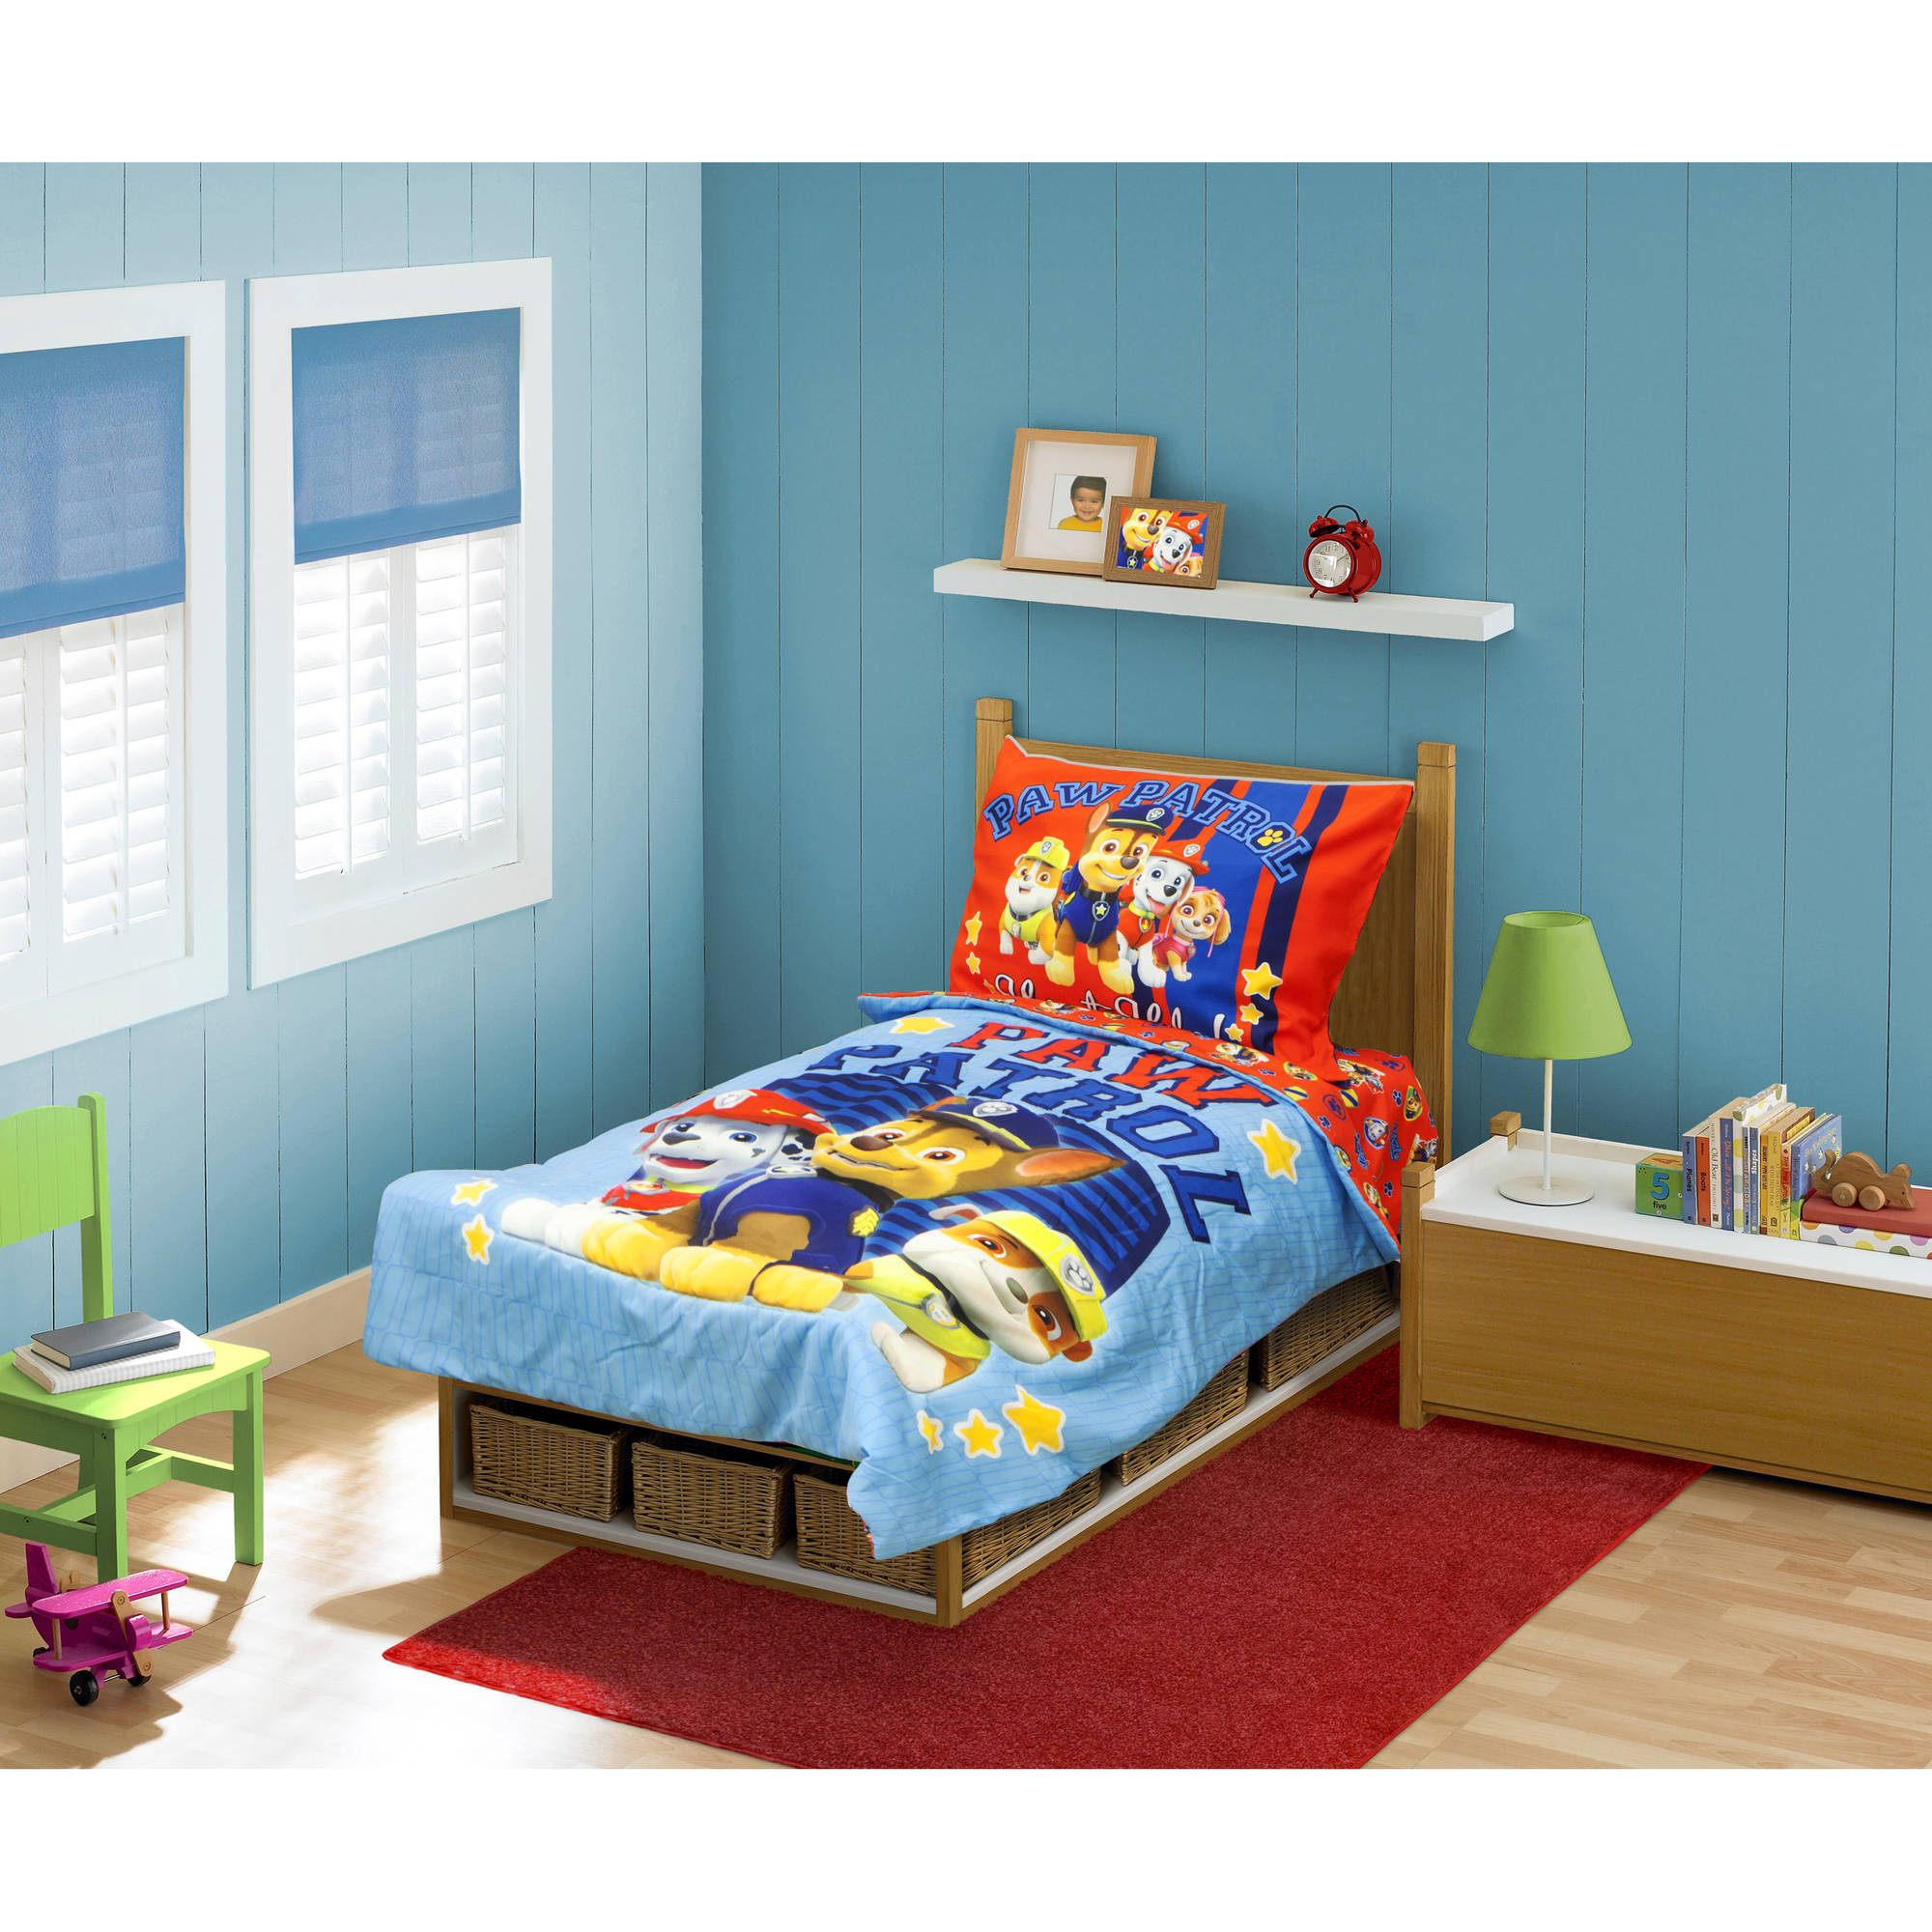 BabyBoom Nick Jr PAW Patrol 4-Piece Toddler Bedding Set Here to Help